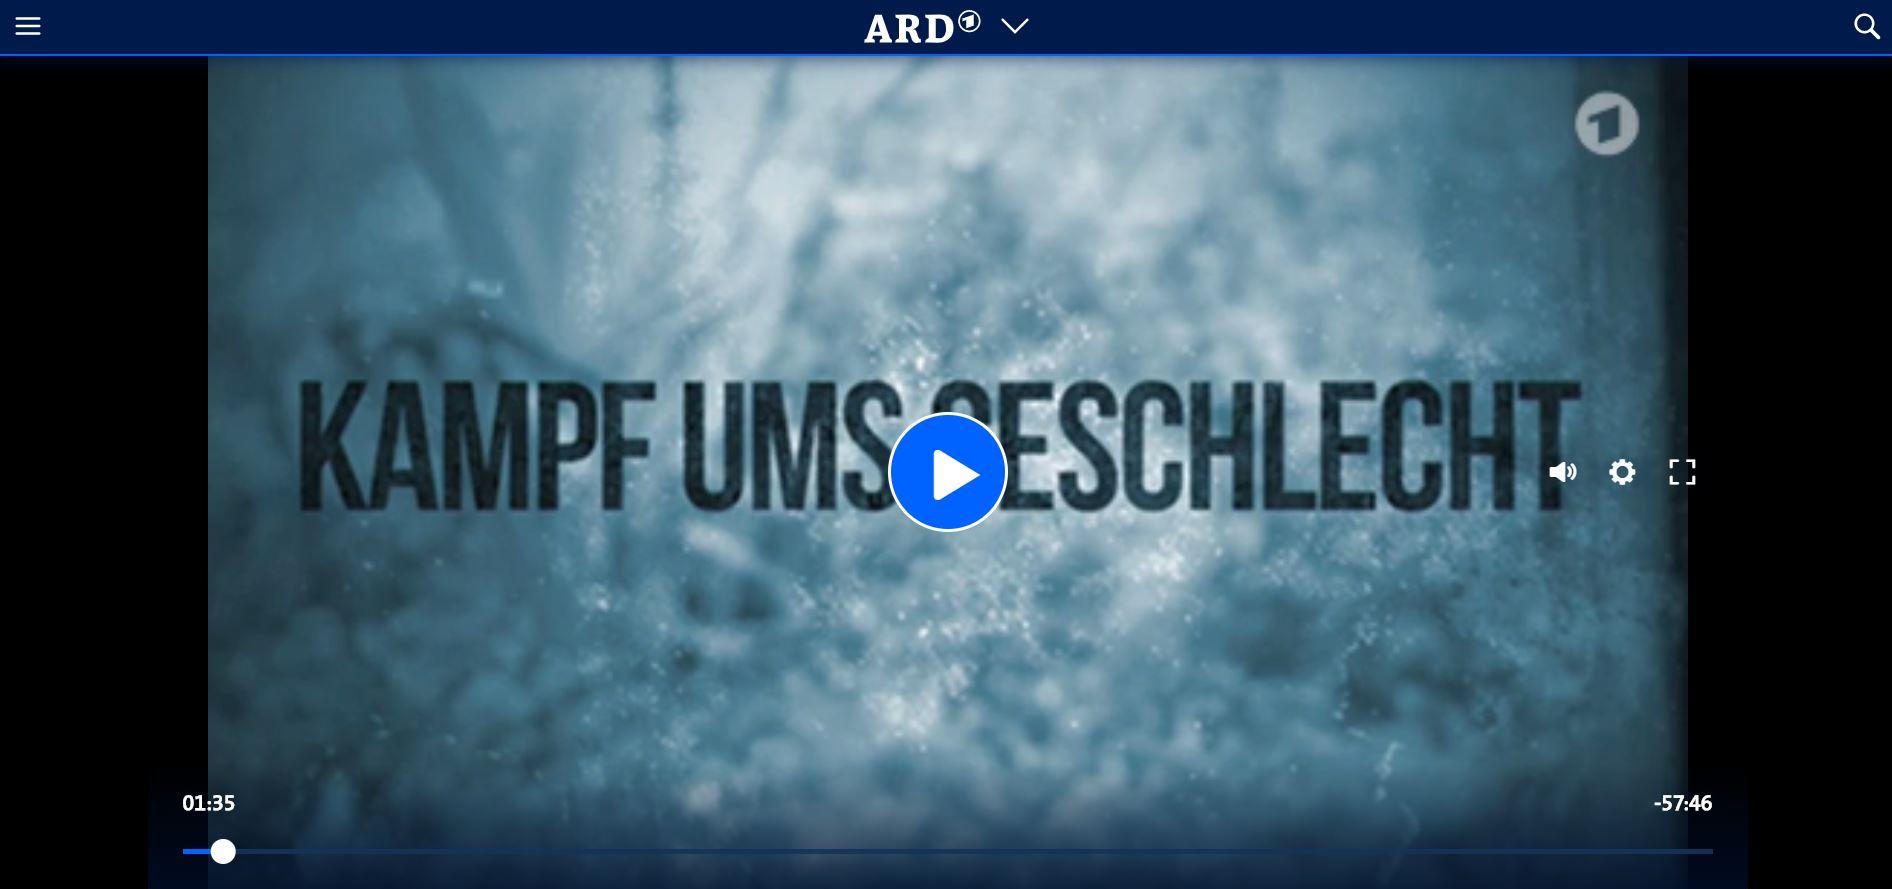 ARD-Doku: Kampf ums Geschlecht - Die verstoßenen Frauen des Sports